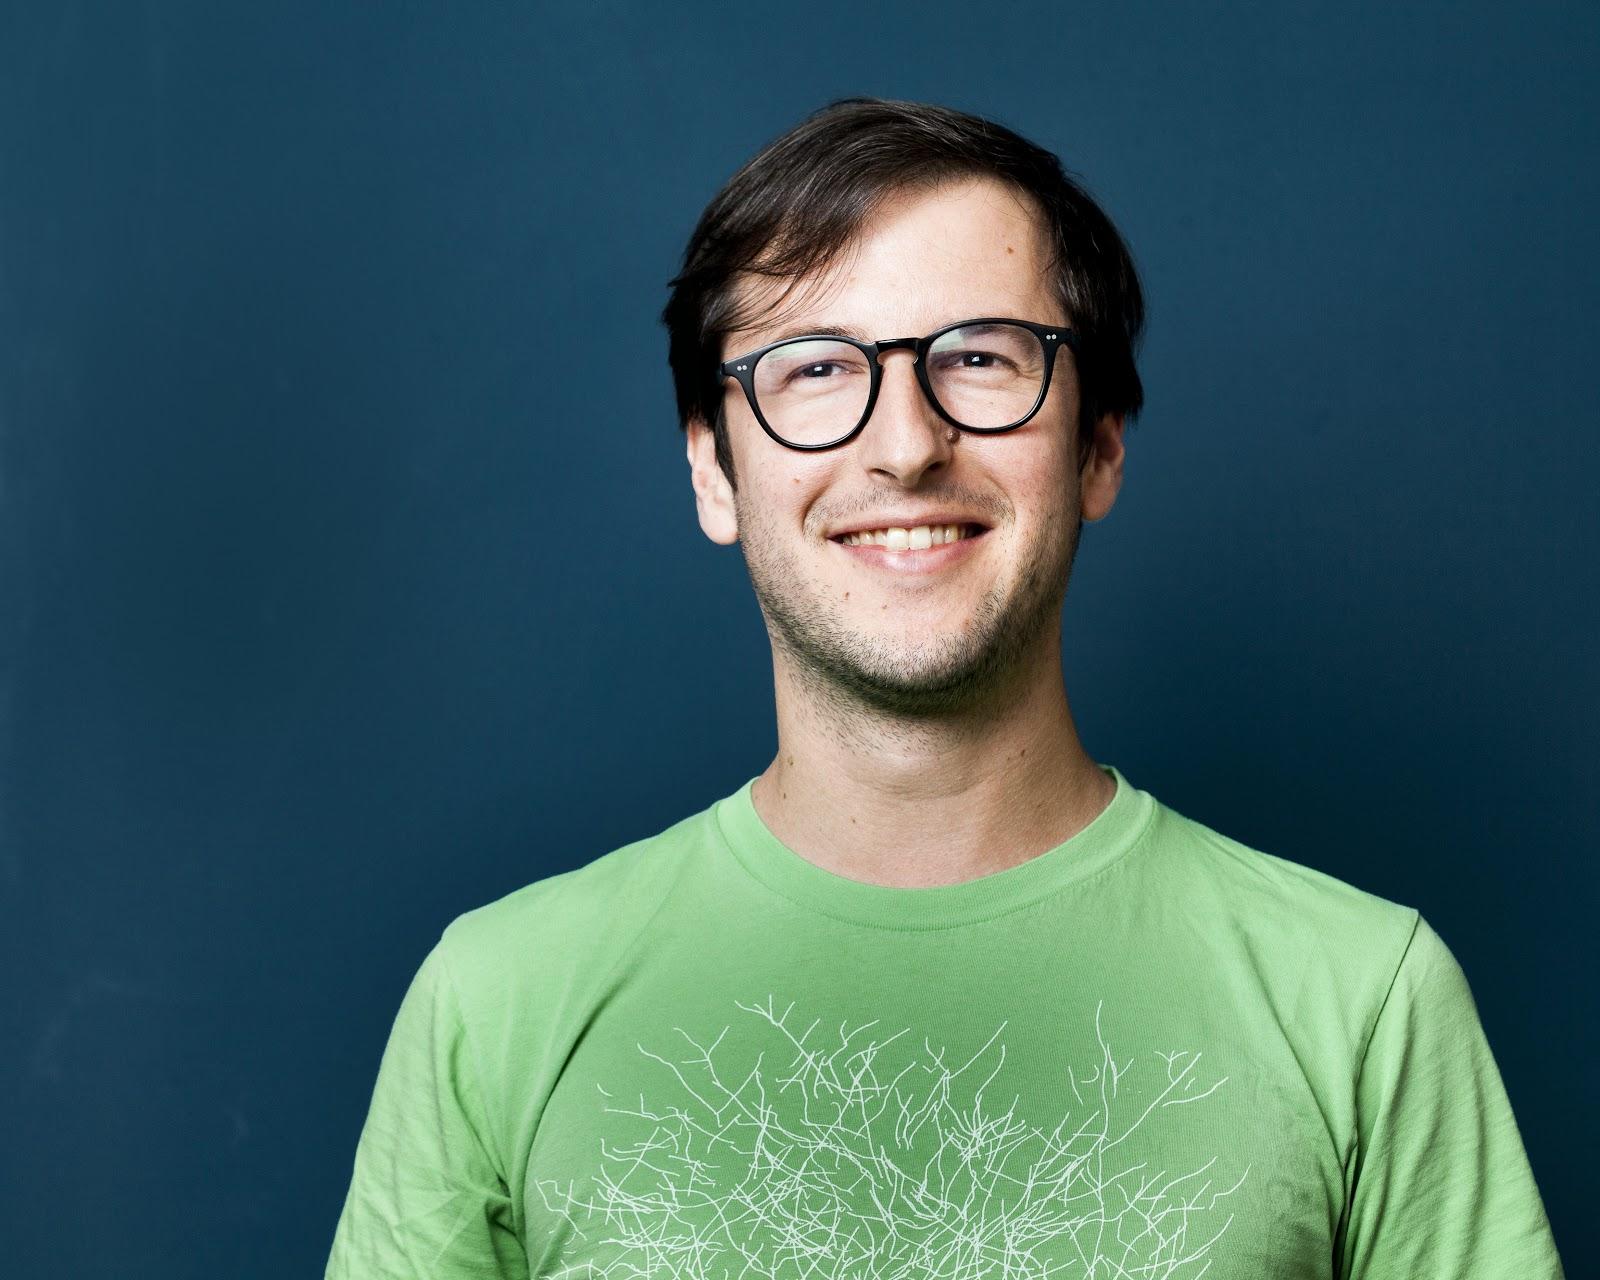 Pau Sabria co-founder of Olapic